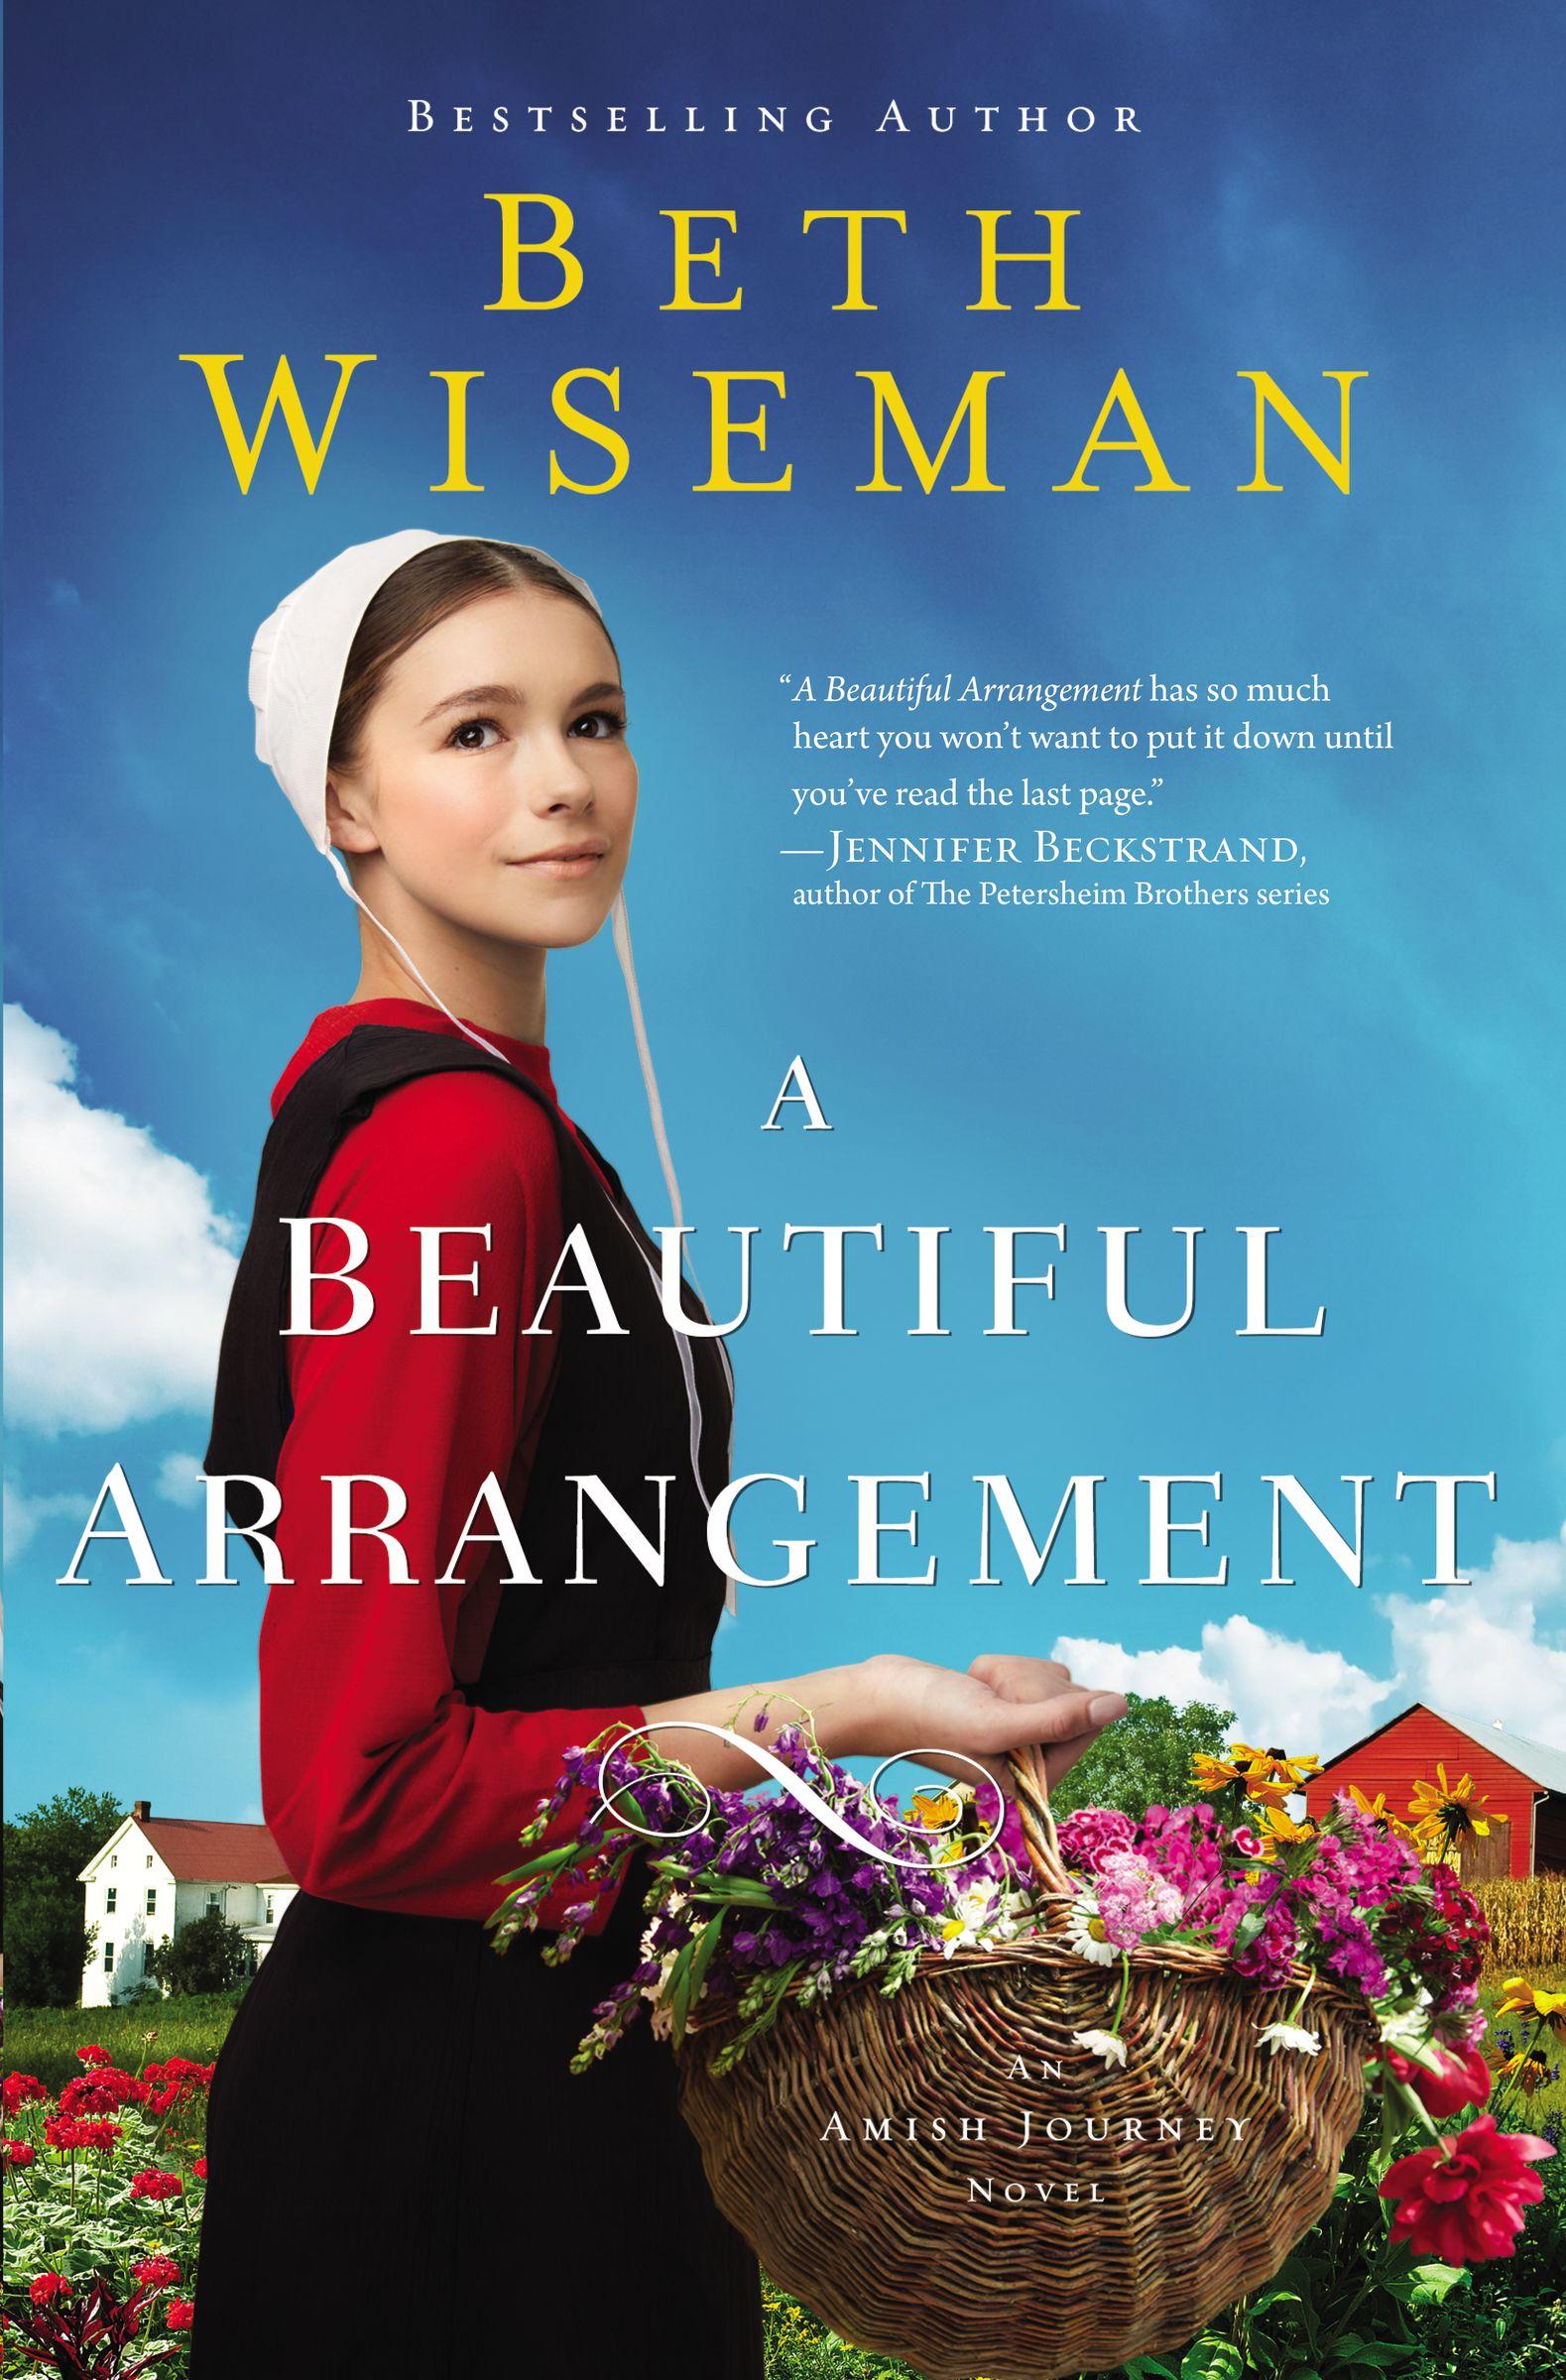 A Beautiful Arrangement (An Amish Journey #3)